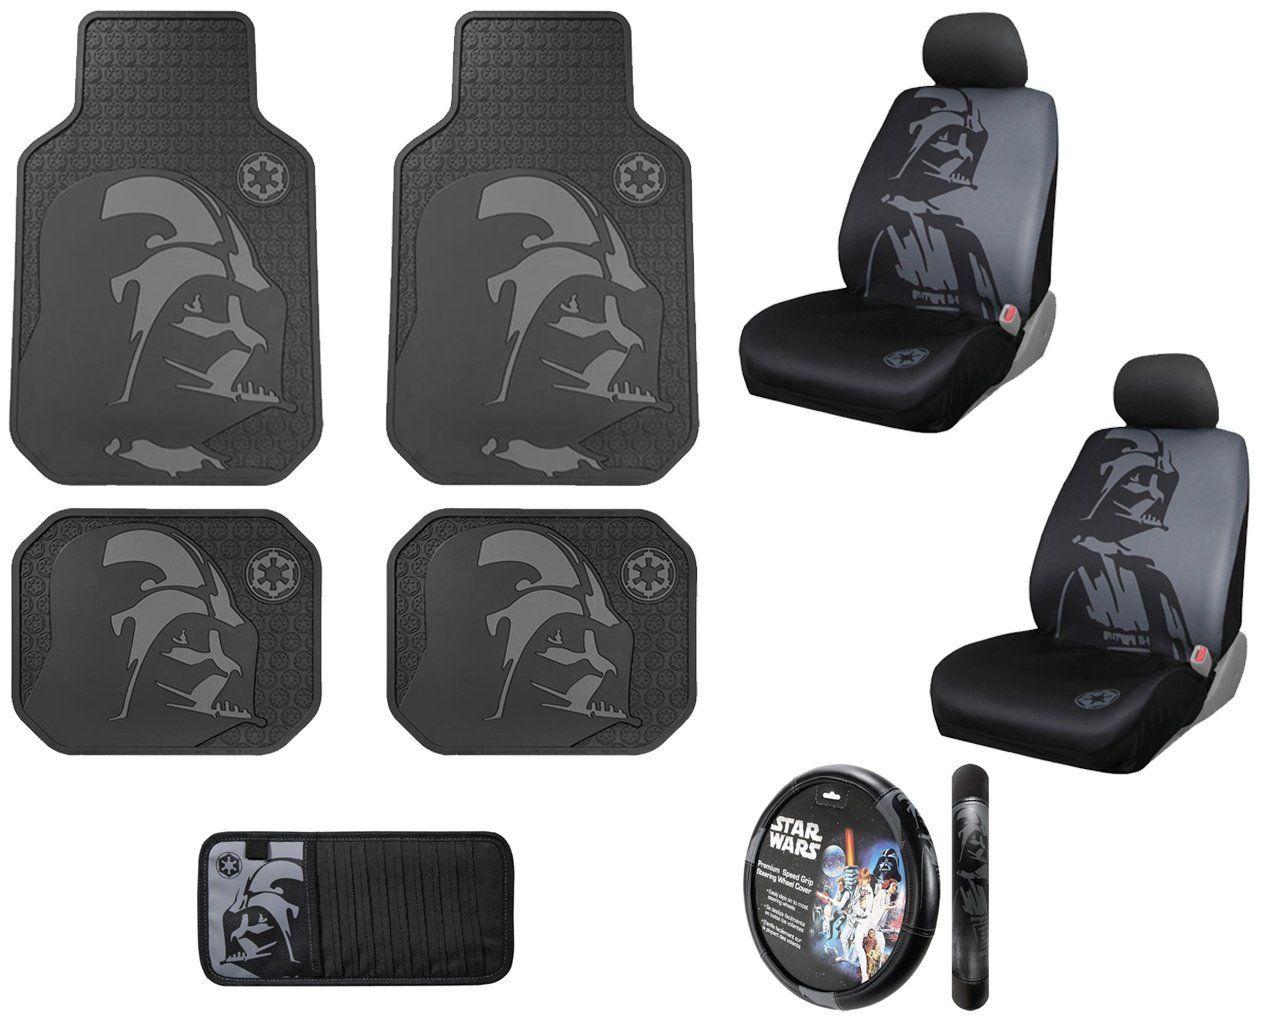 Star Wars Car Accessories